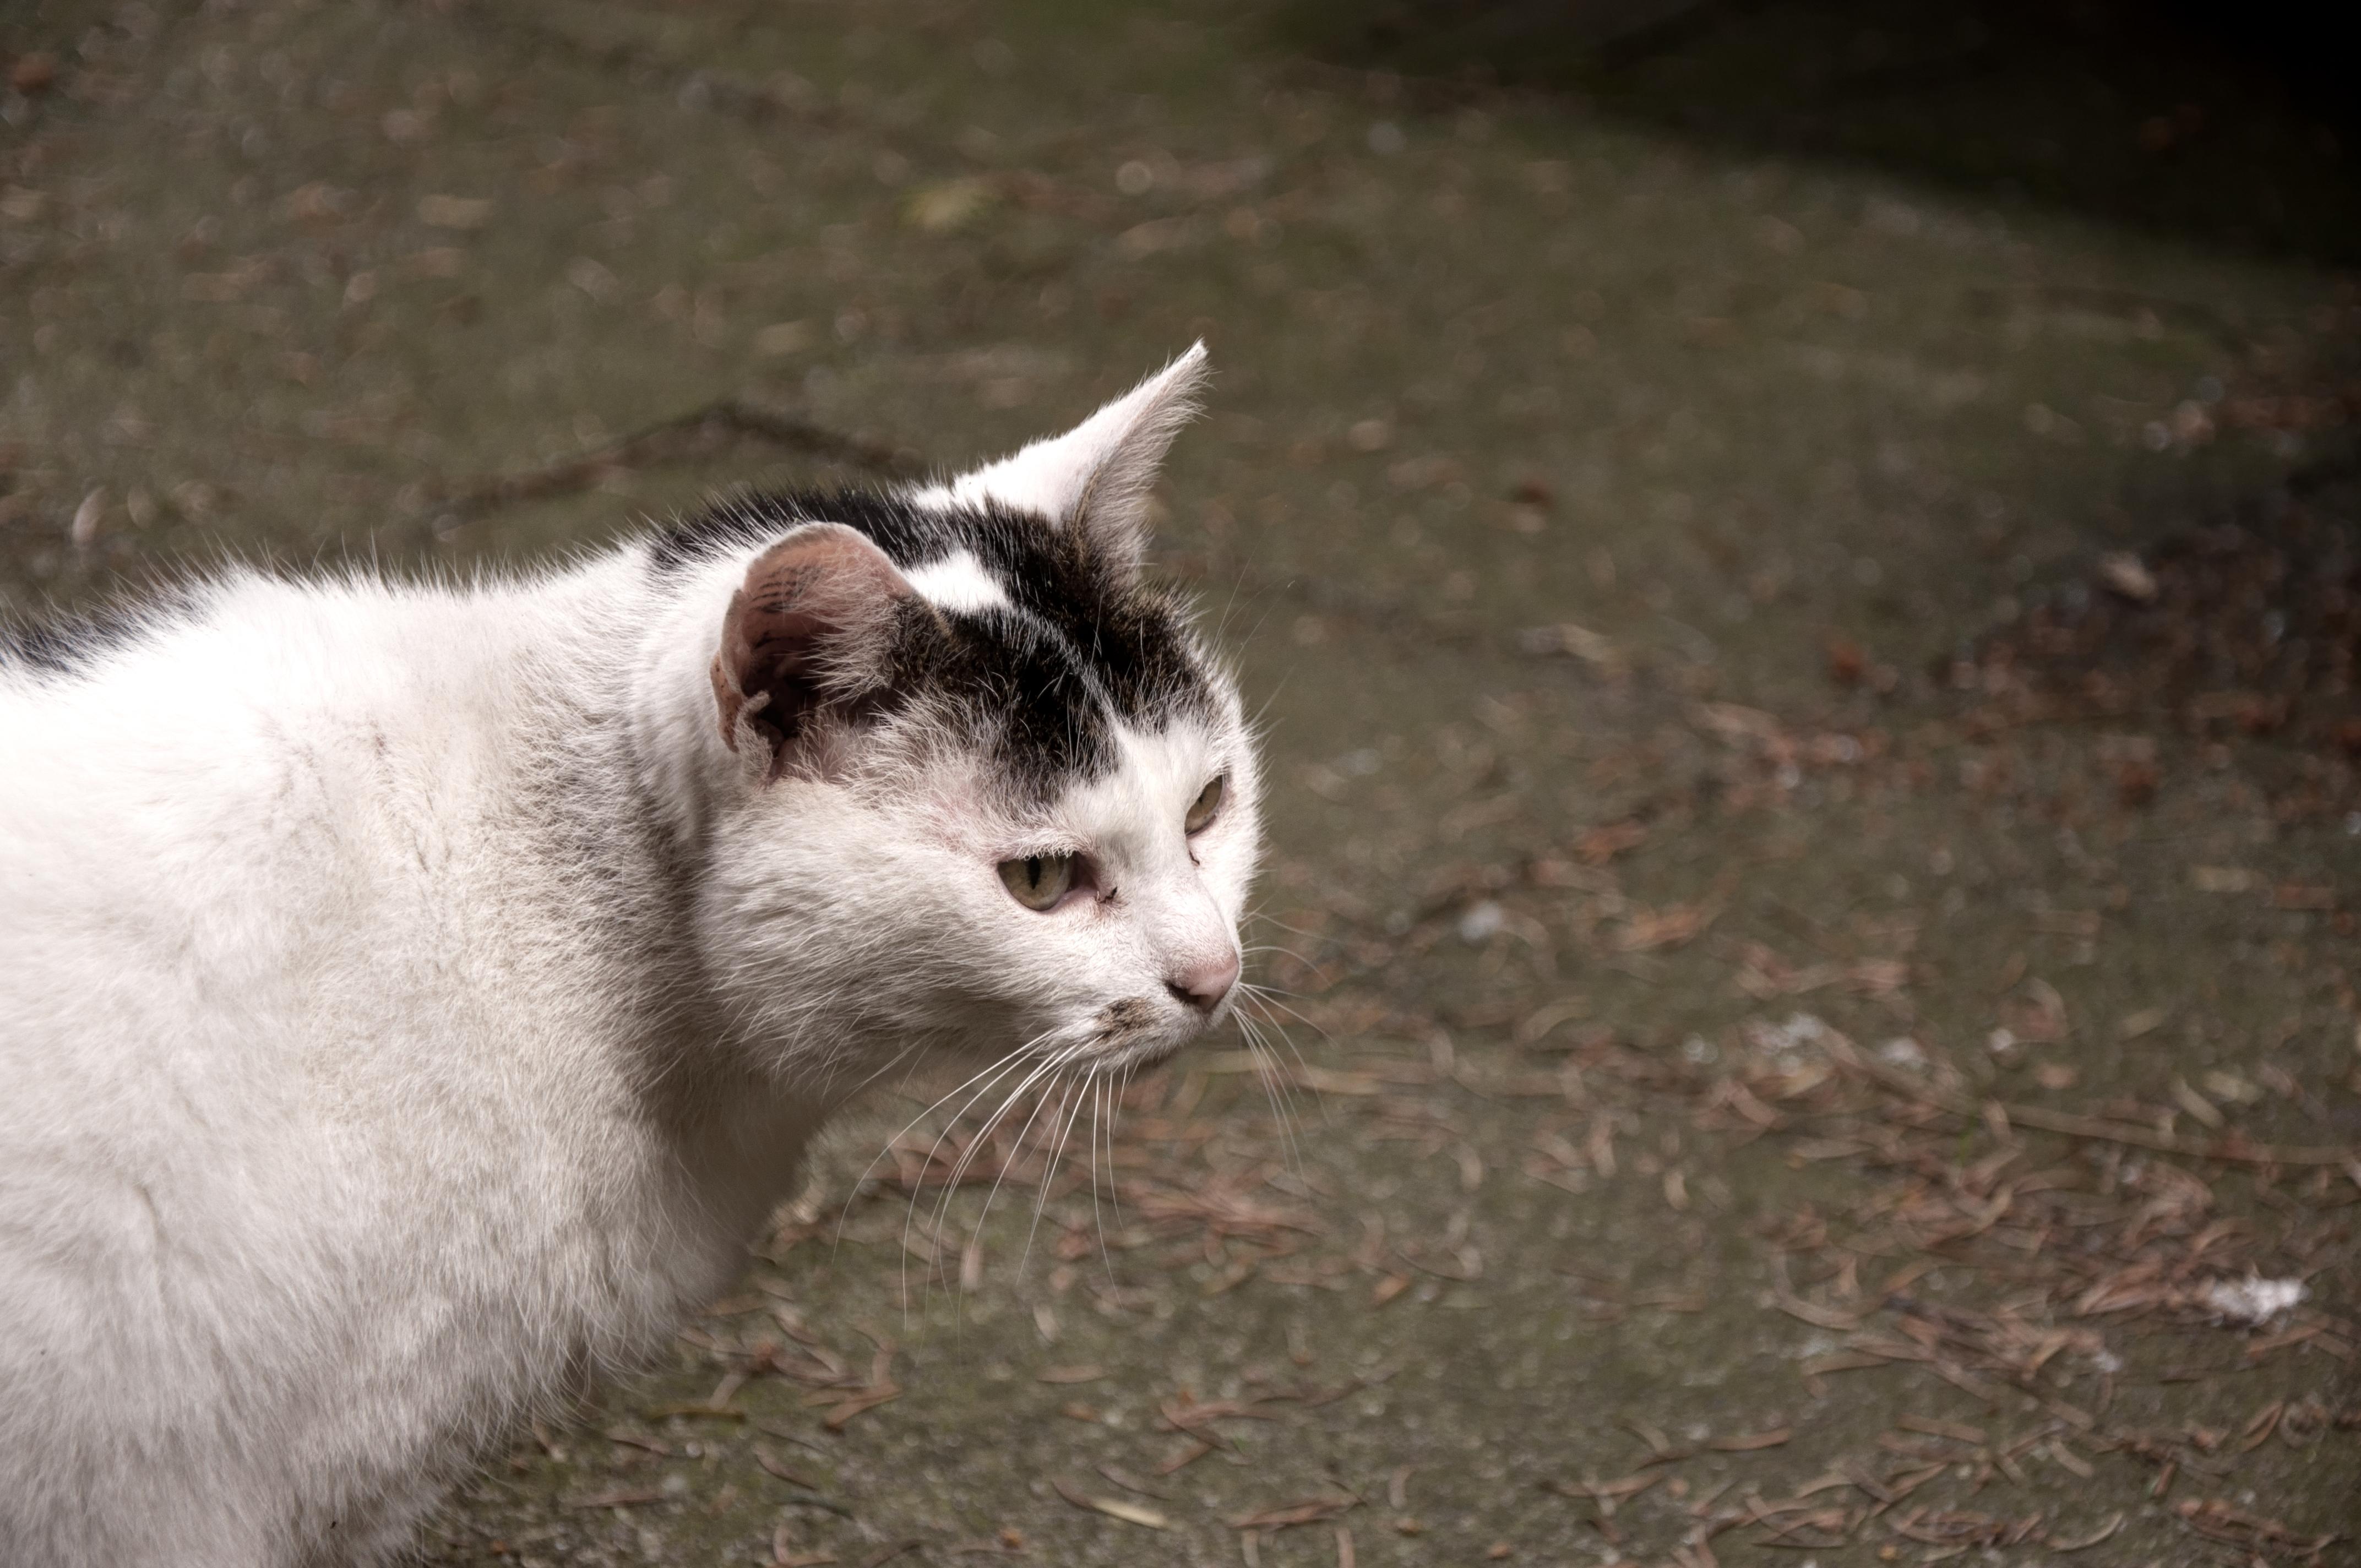 Black N White Spotty Cat Cc0 Photo